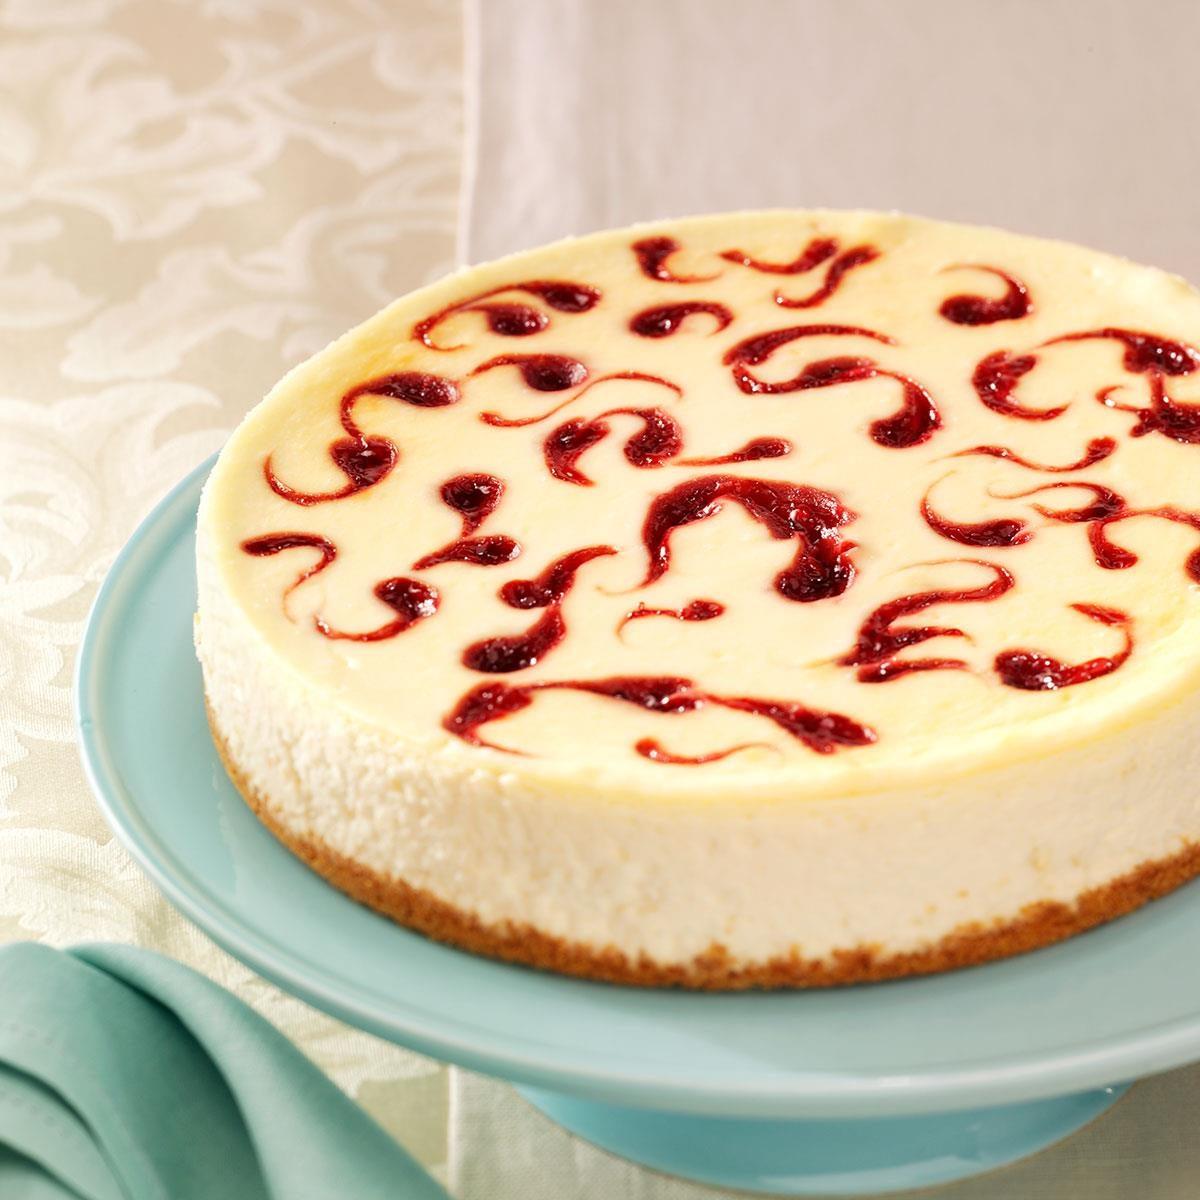 White Chocolate Raspberry Cheesecake Recipe | Taste of Home